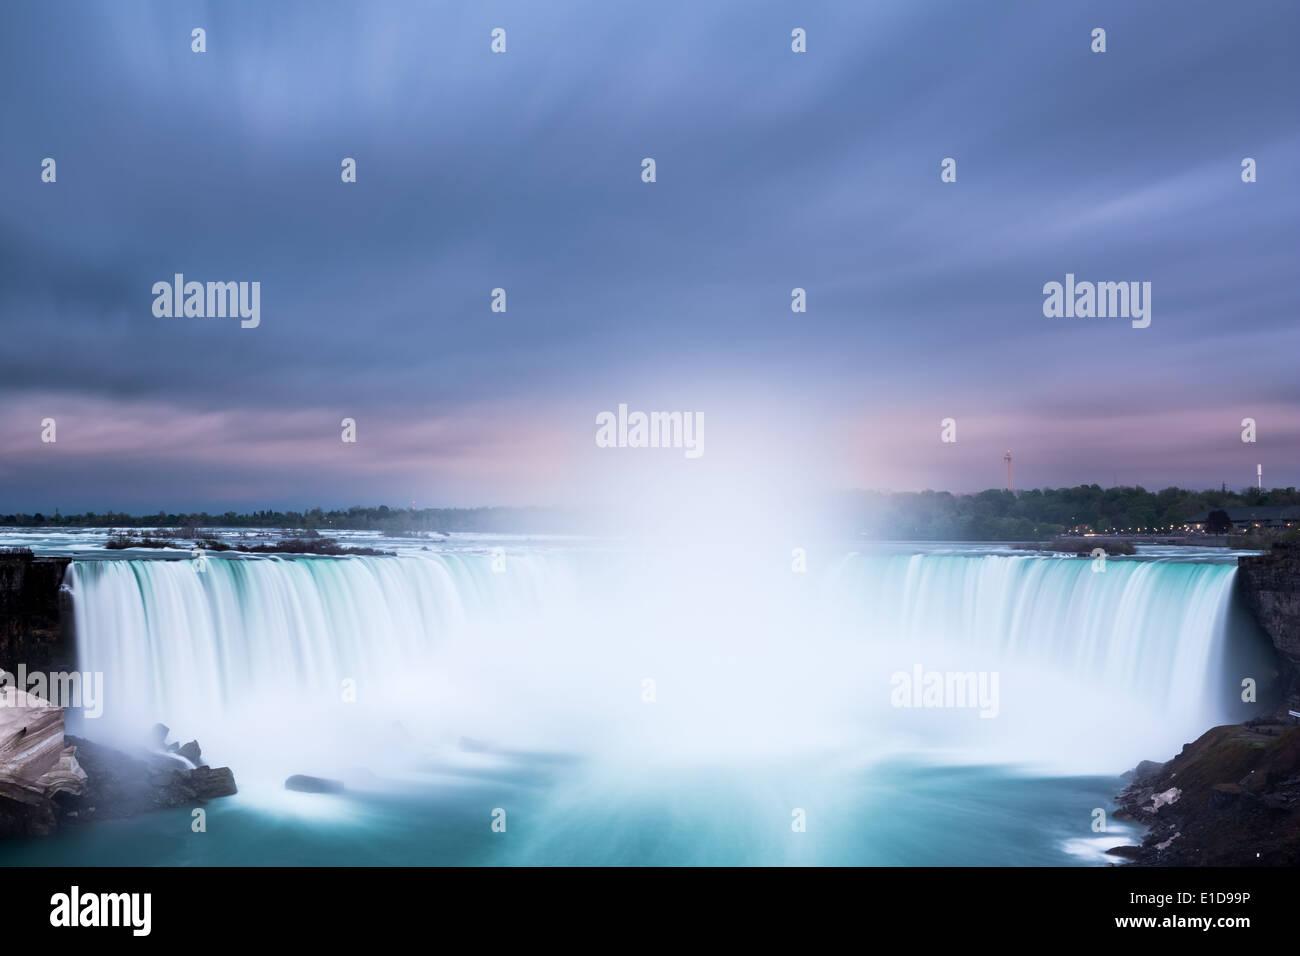 Horseshoe Falls at Niagara Falls viewed from the Canadian side. - Stock Image